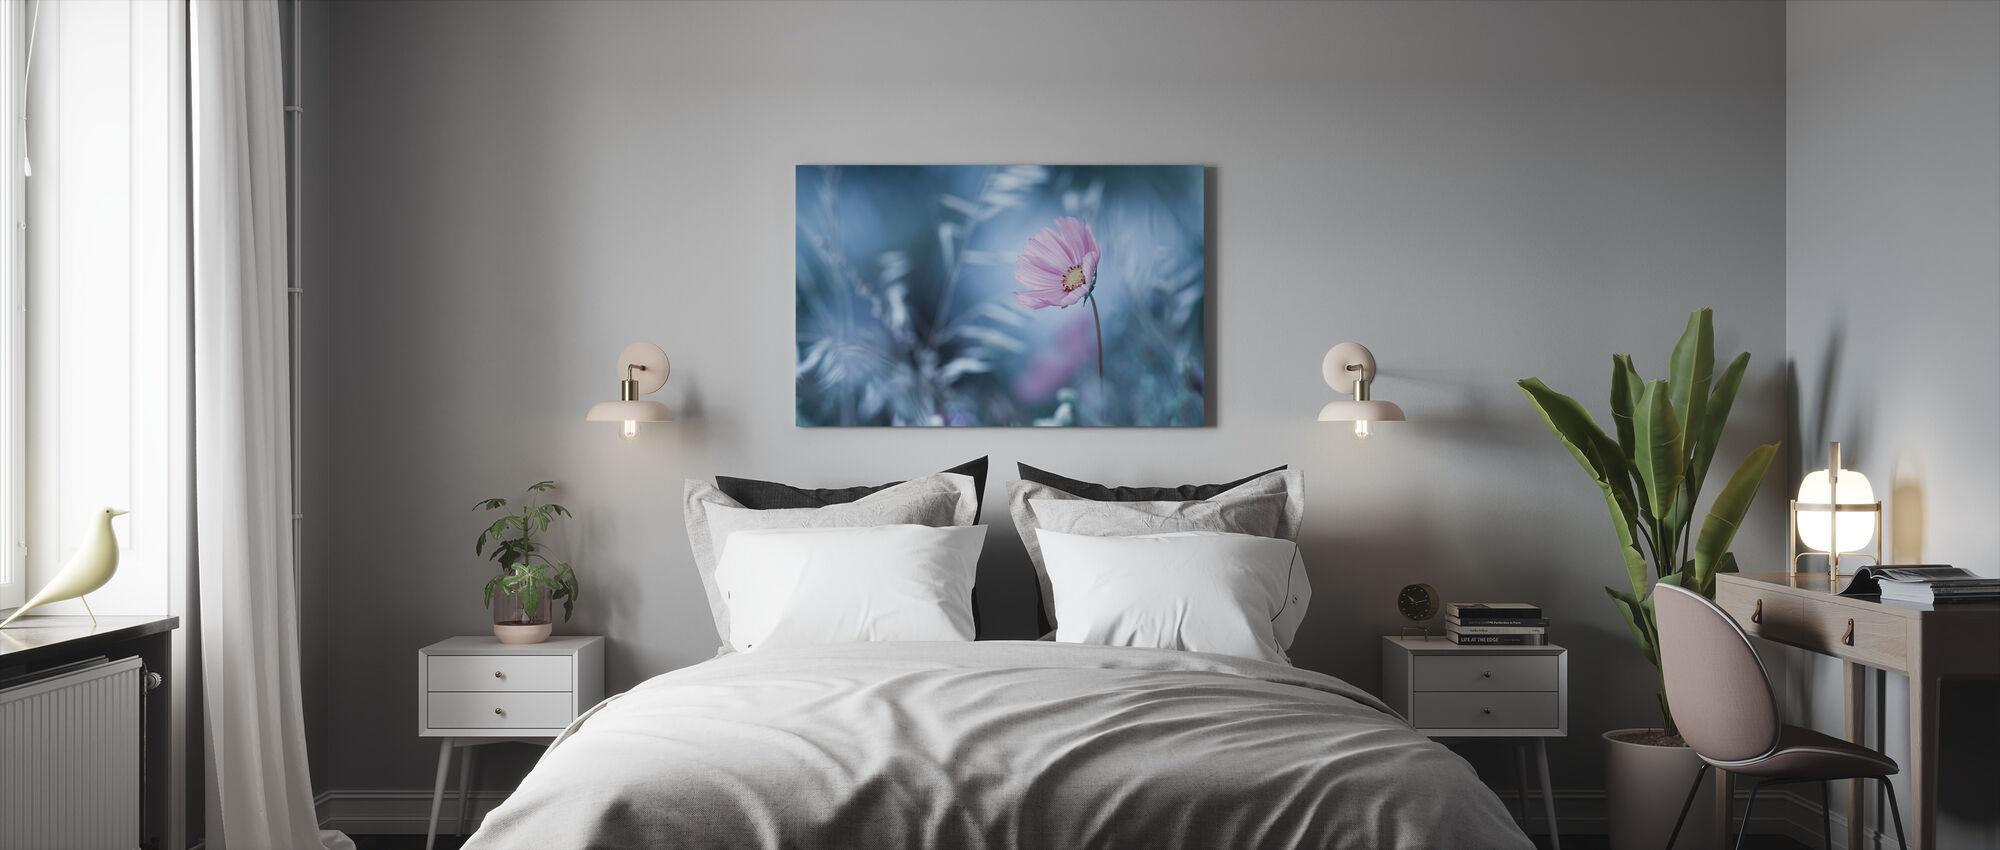 A Walk in Dreamland - Canvas print - Bedroom